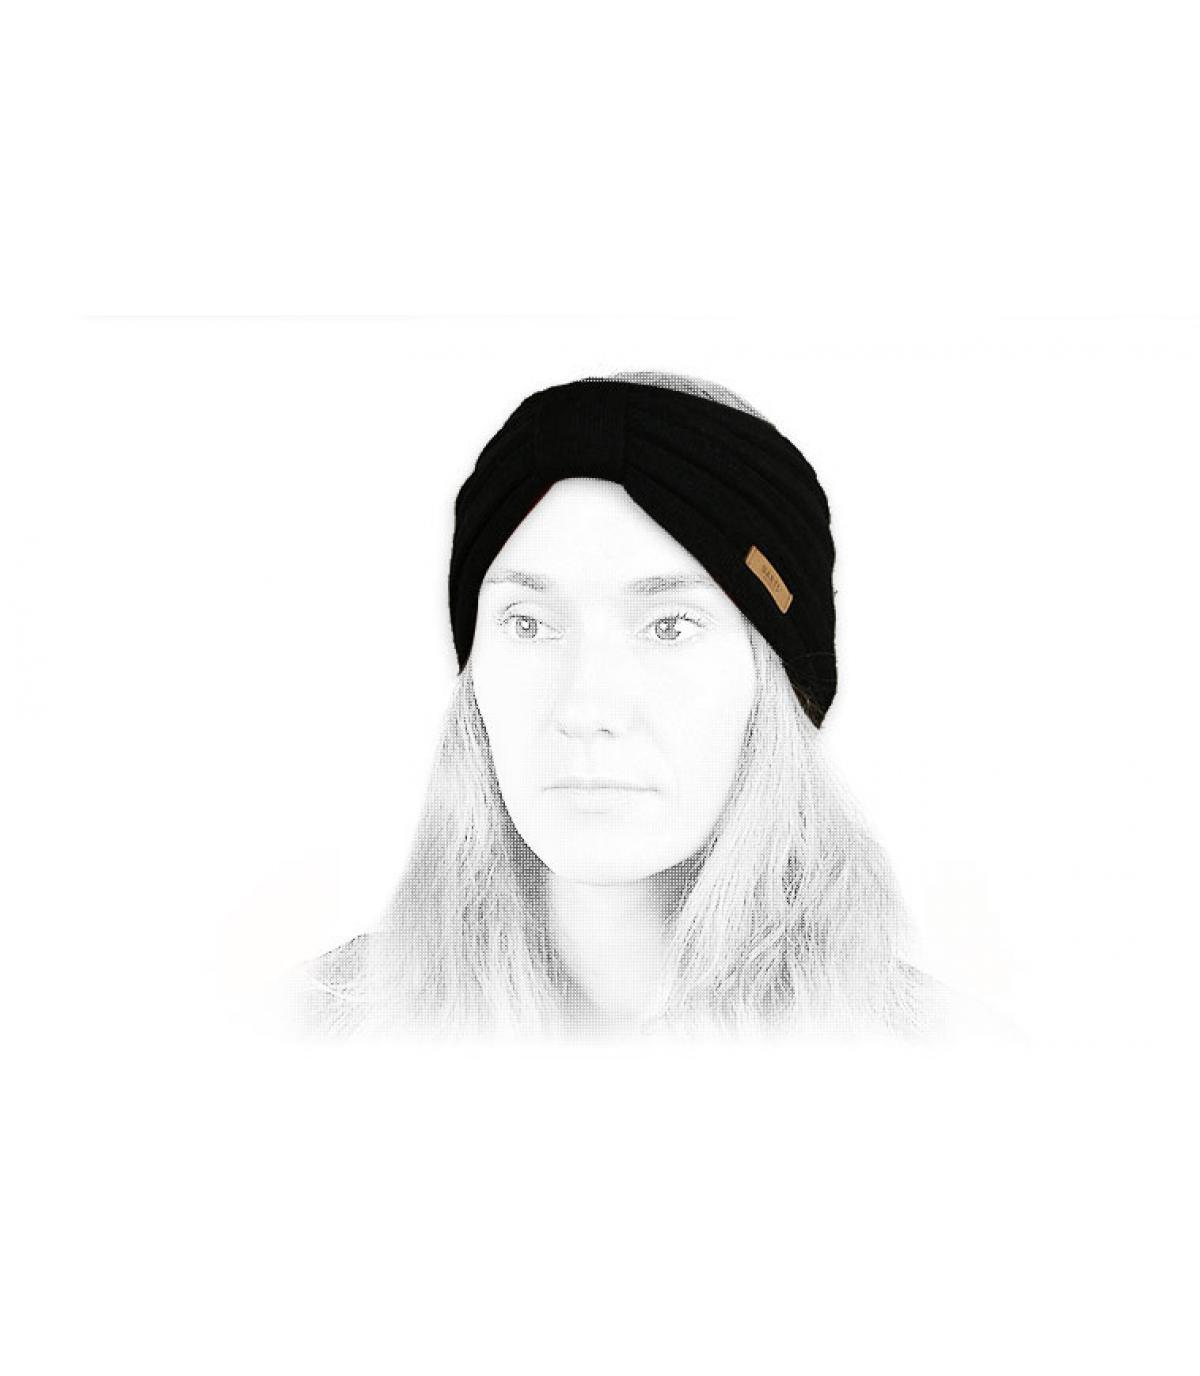 Details Zitoun Headband black - afbeeling 4